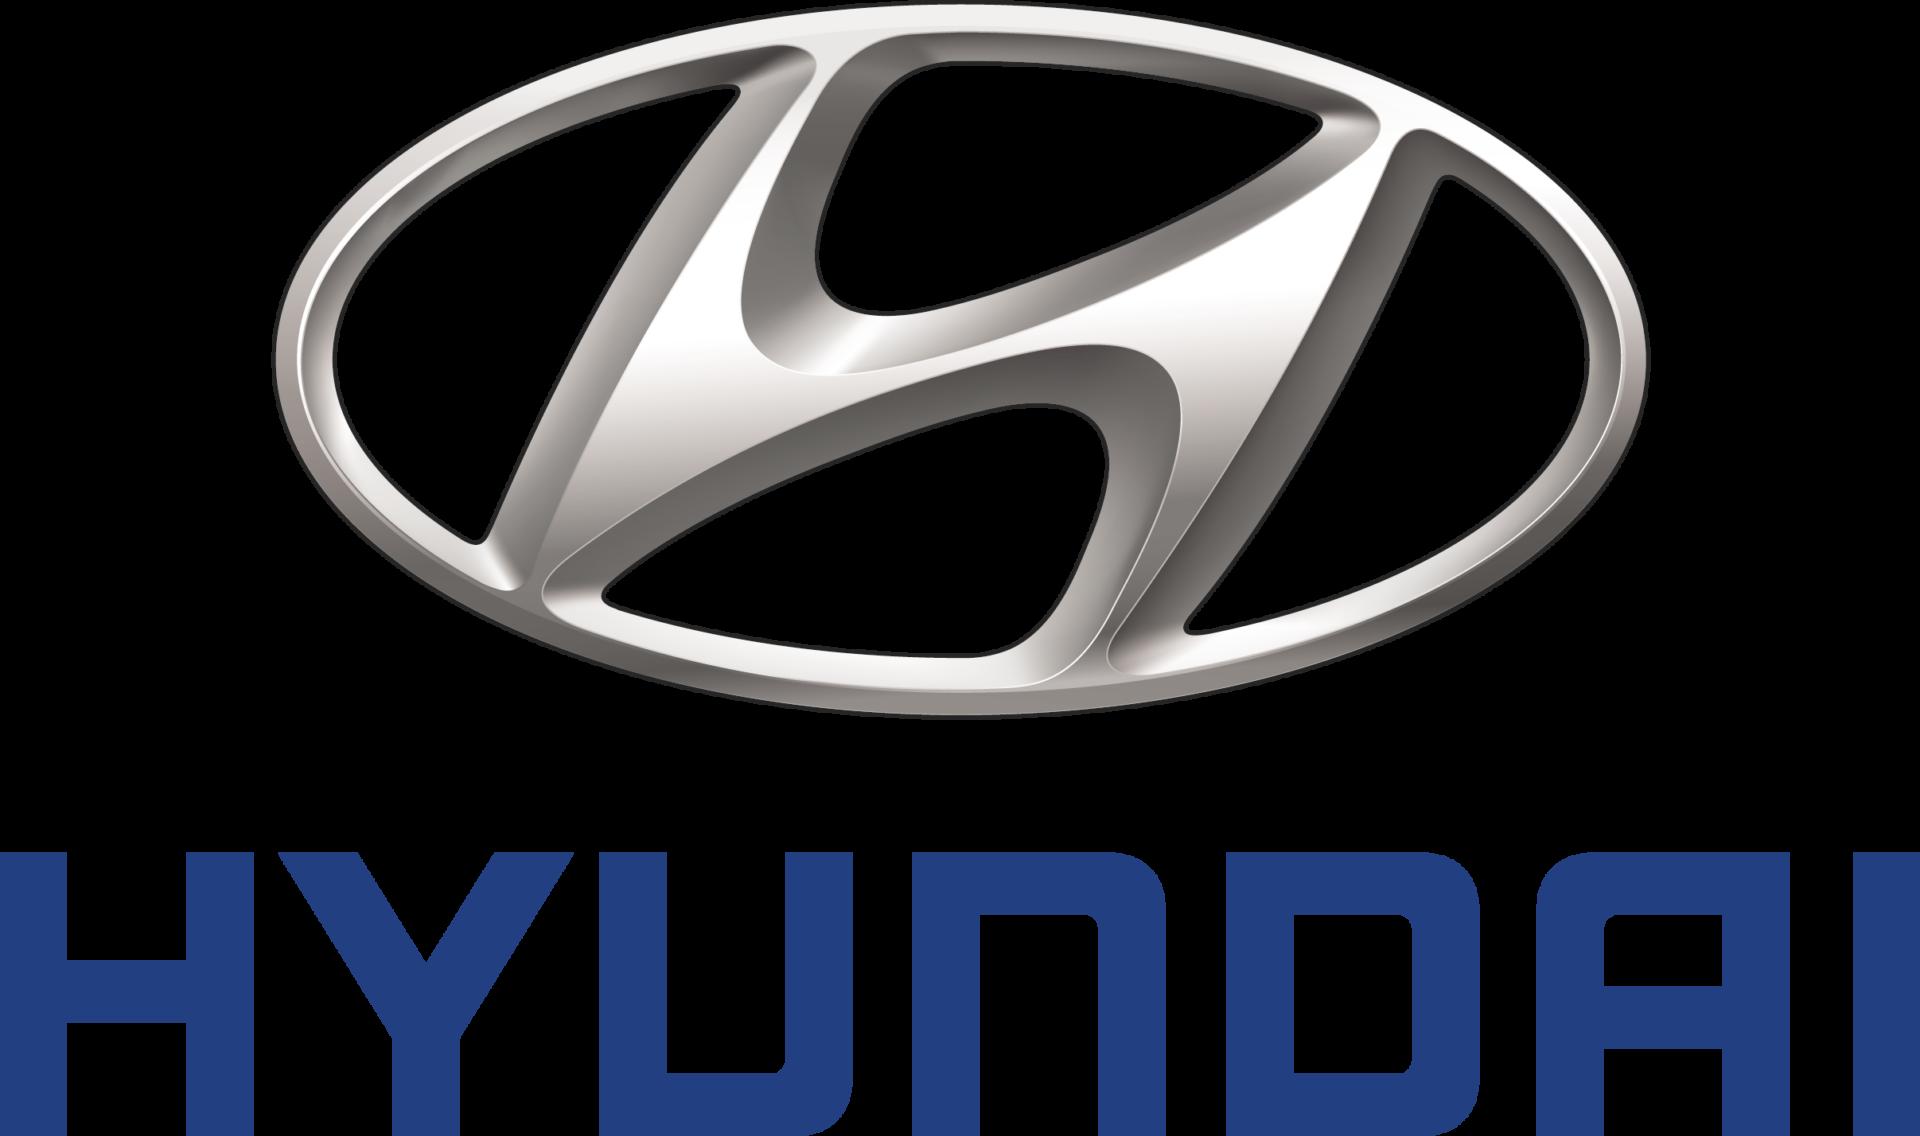 Pastiglie freno CL Hyundai